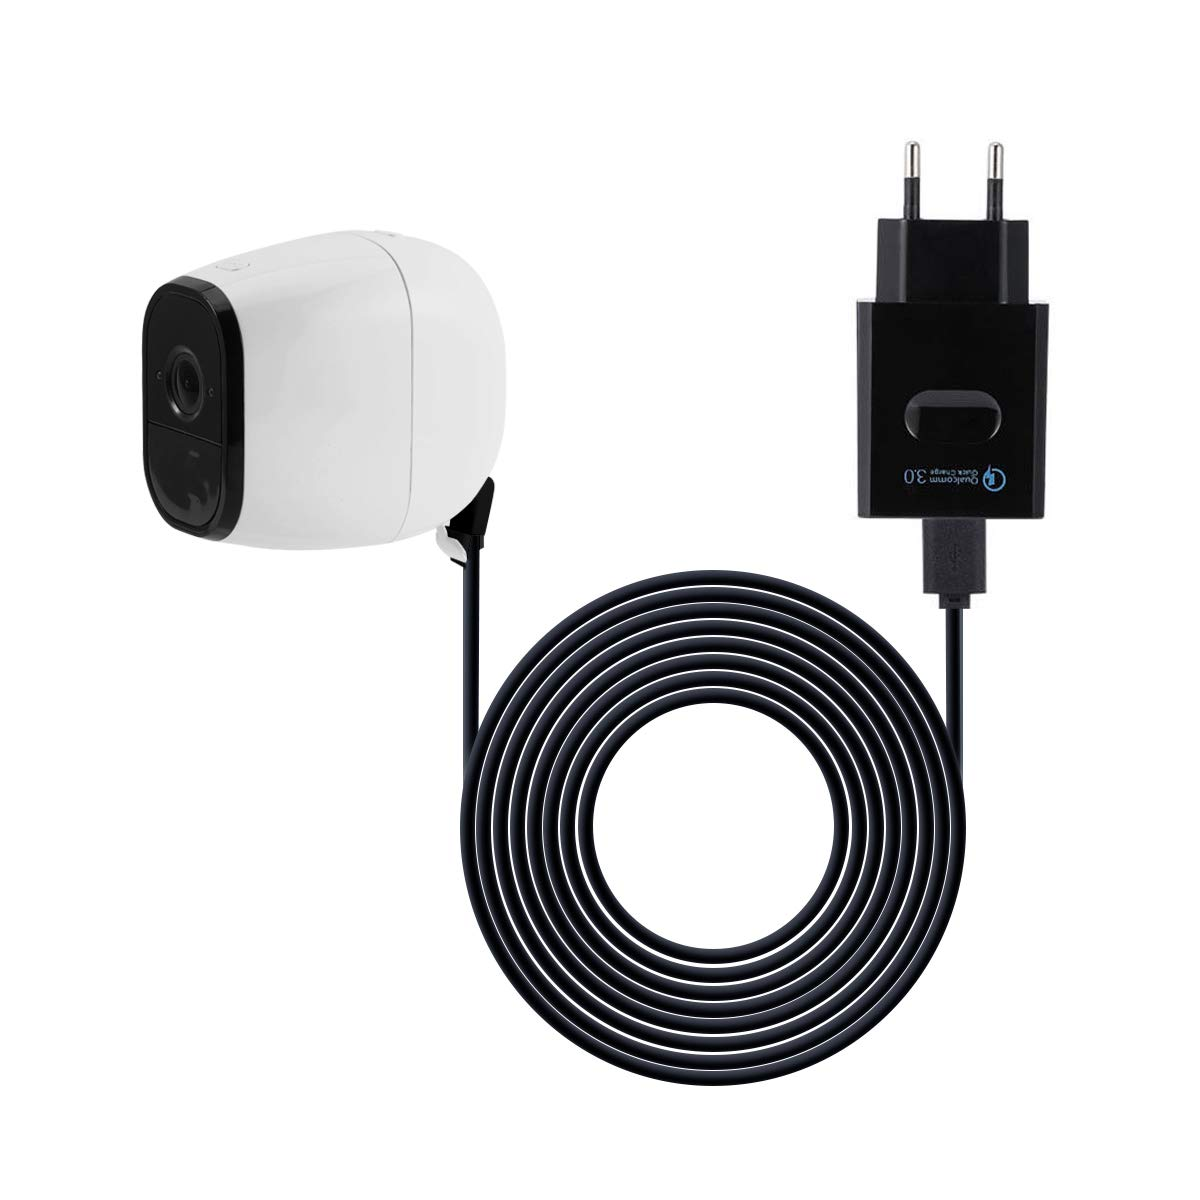 Ladekabel fü r Arlo Pro, LANMU Kabel mit USB Netzteil Ladegerä t Adapter fü r Netgear Arlo Pro und Arlo Pro 2 Ü berwachung Kamera (5m) (Weiß ) AieveDirect